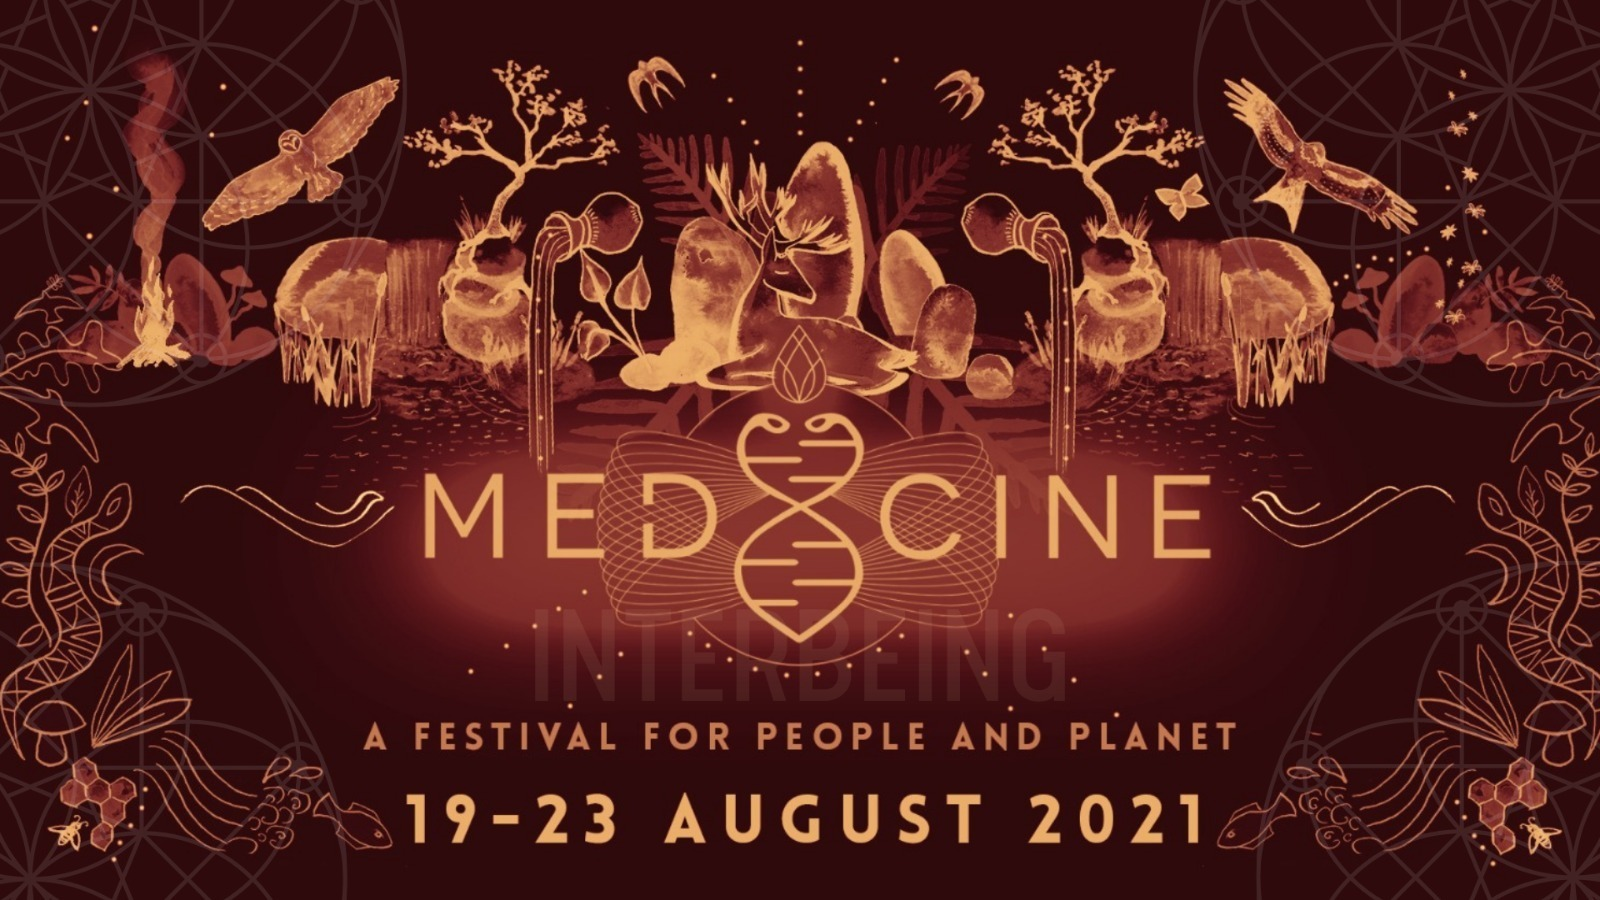 Medicine Festival 2021 // A Festival for People & Planet